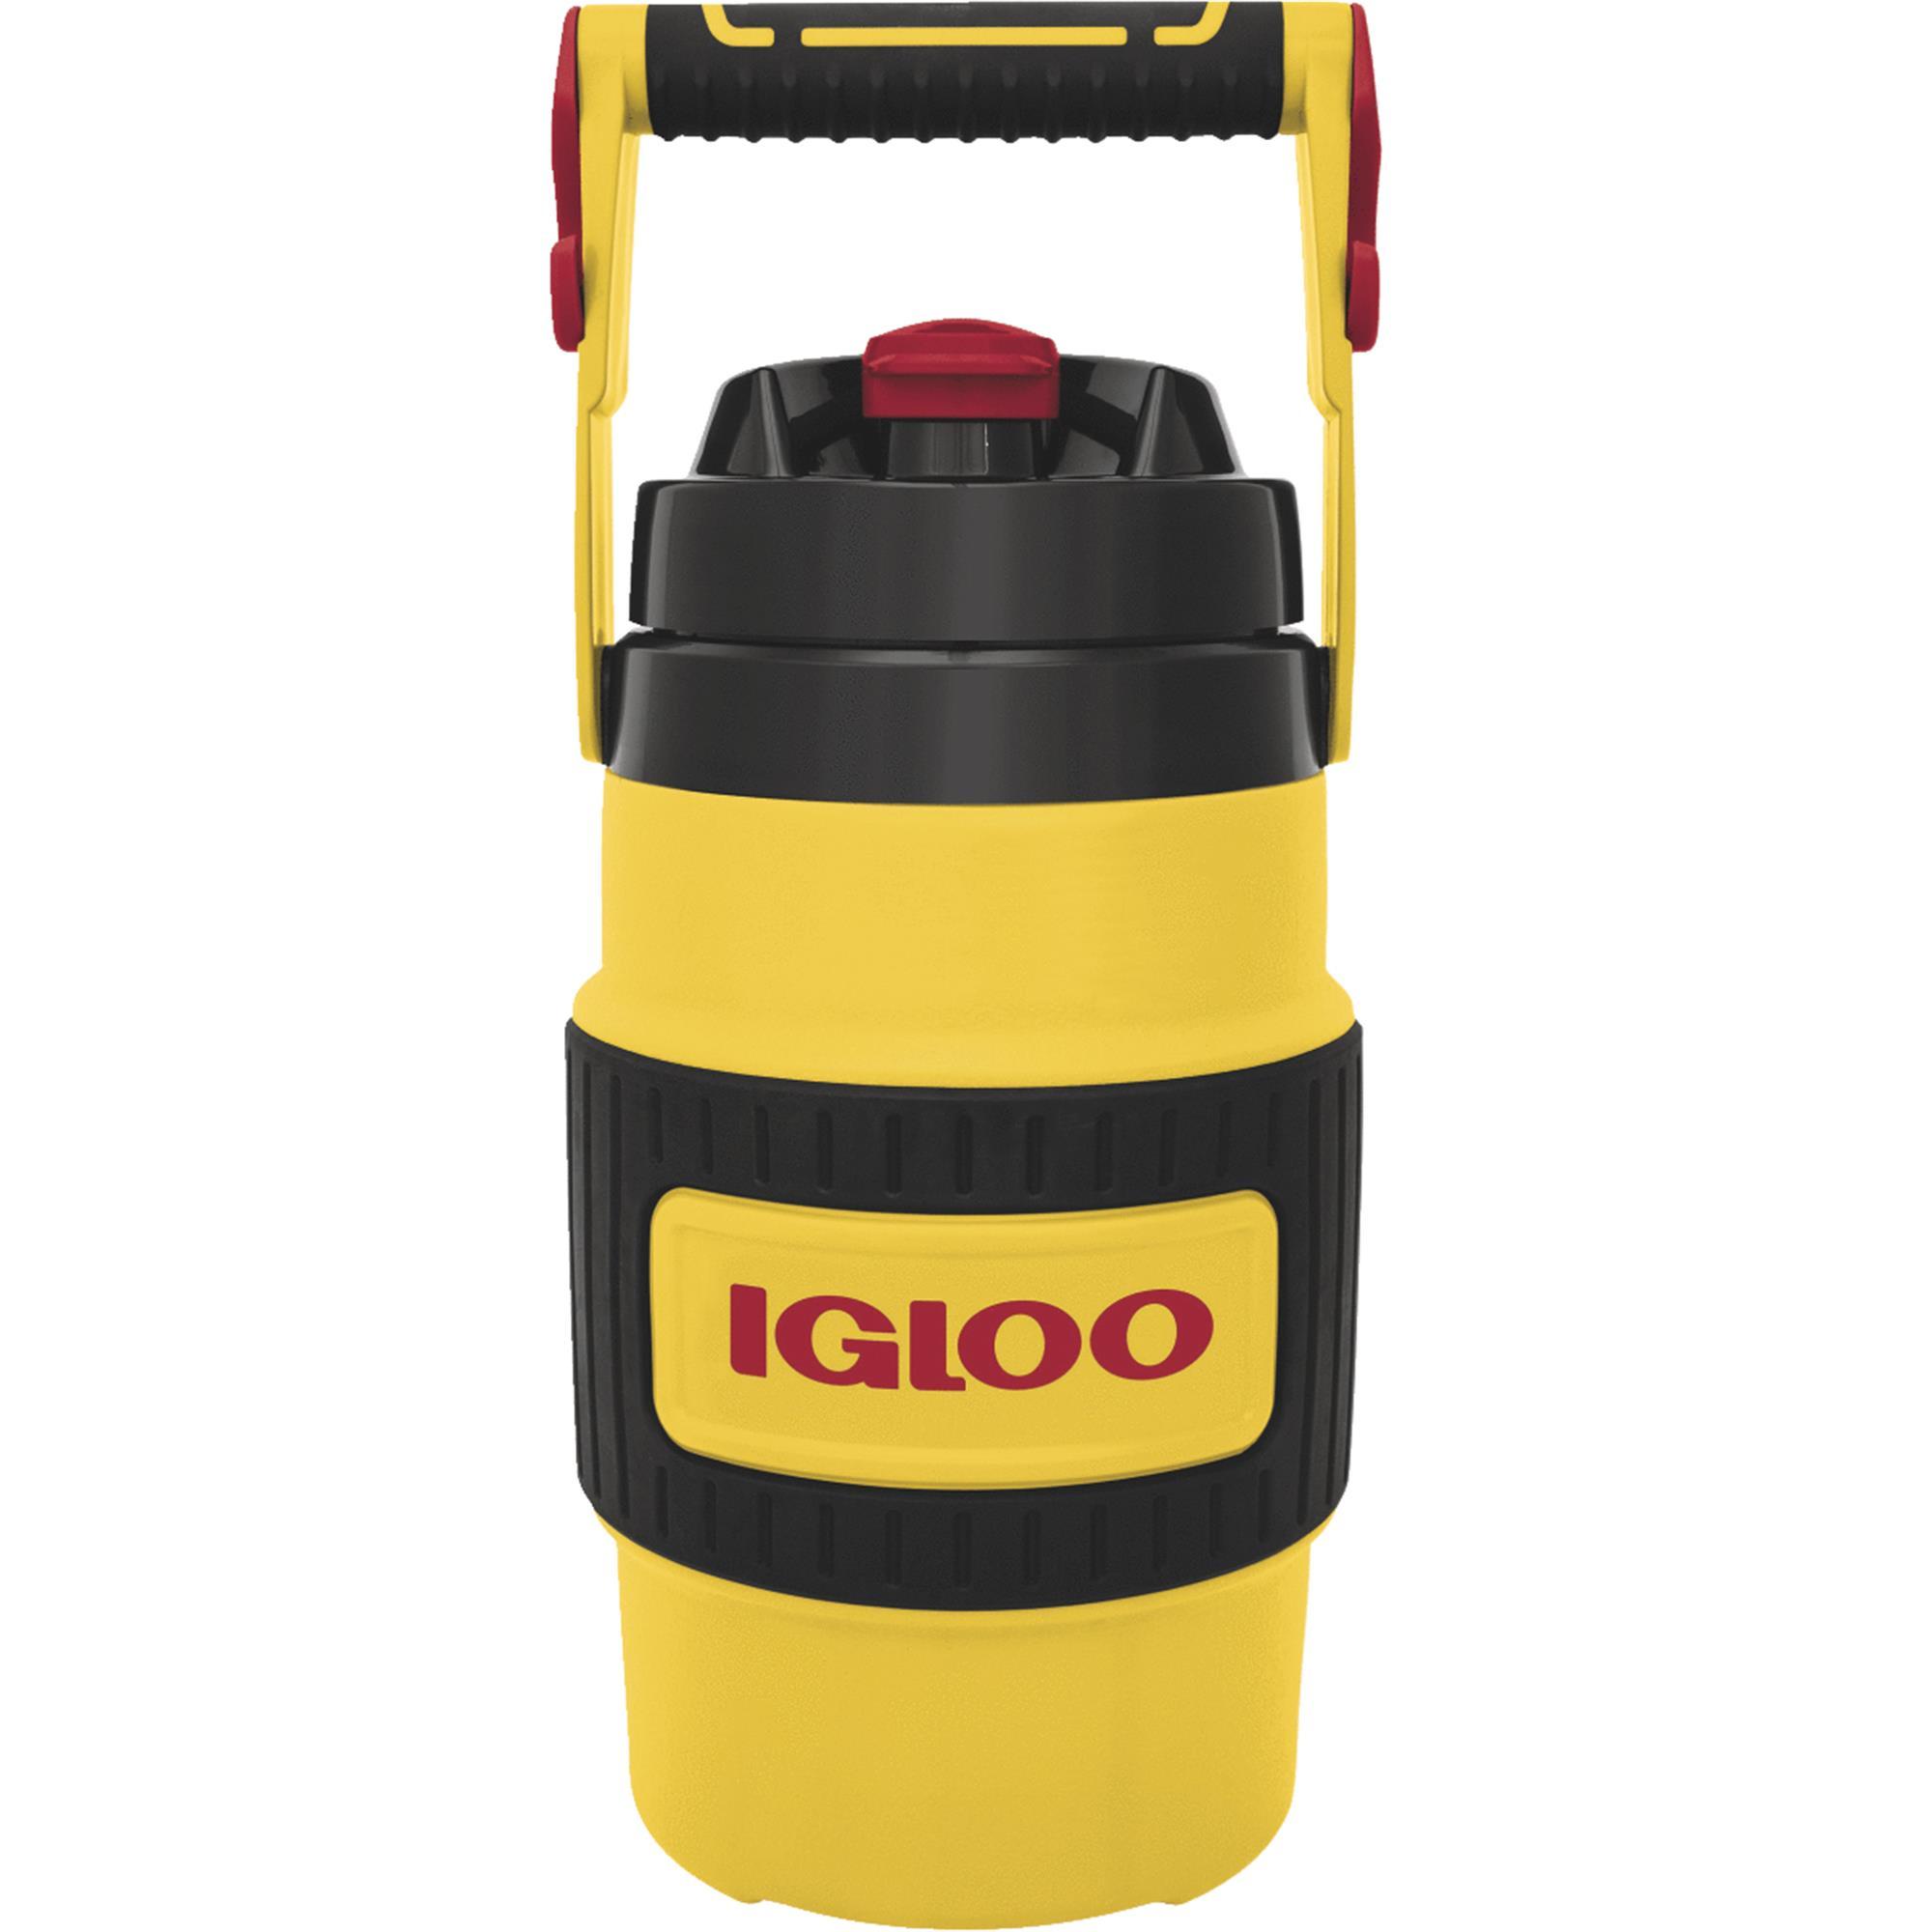 Igloo Non-Slip Grip Industrial Water Jug